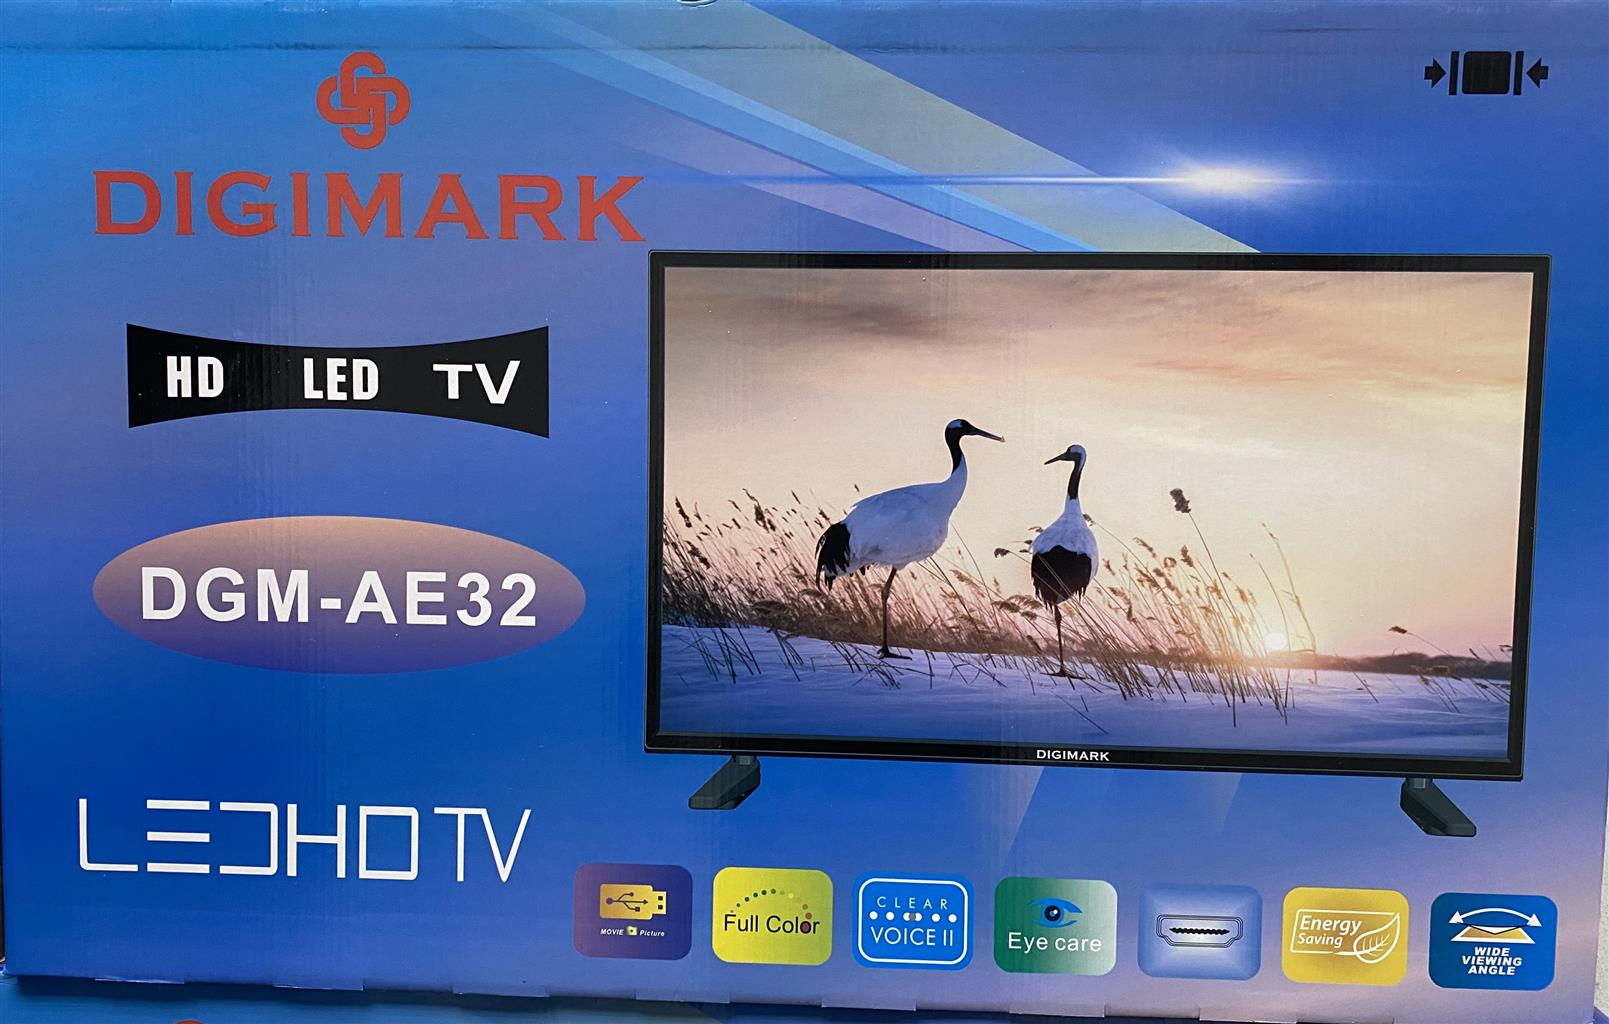 32 inch DIGIMARK tvs